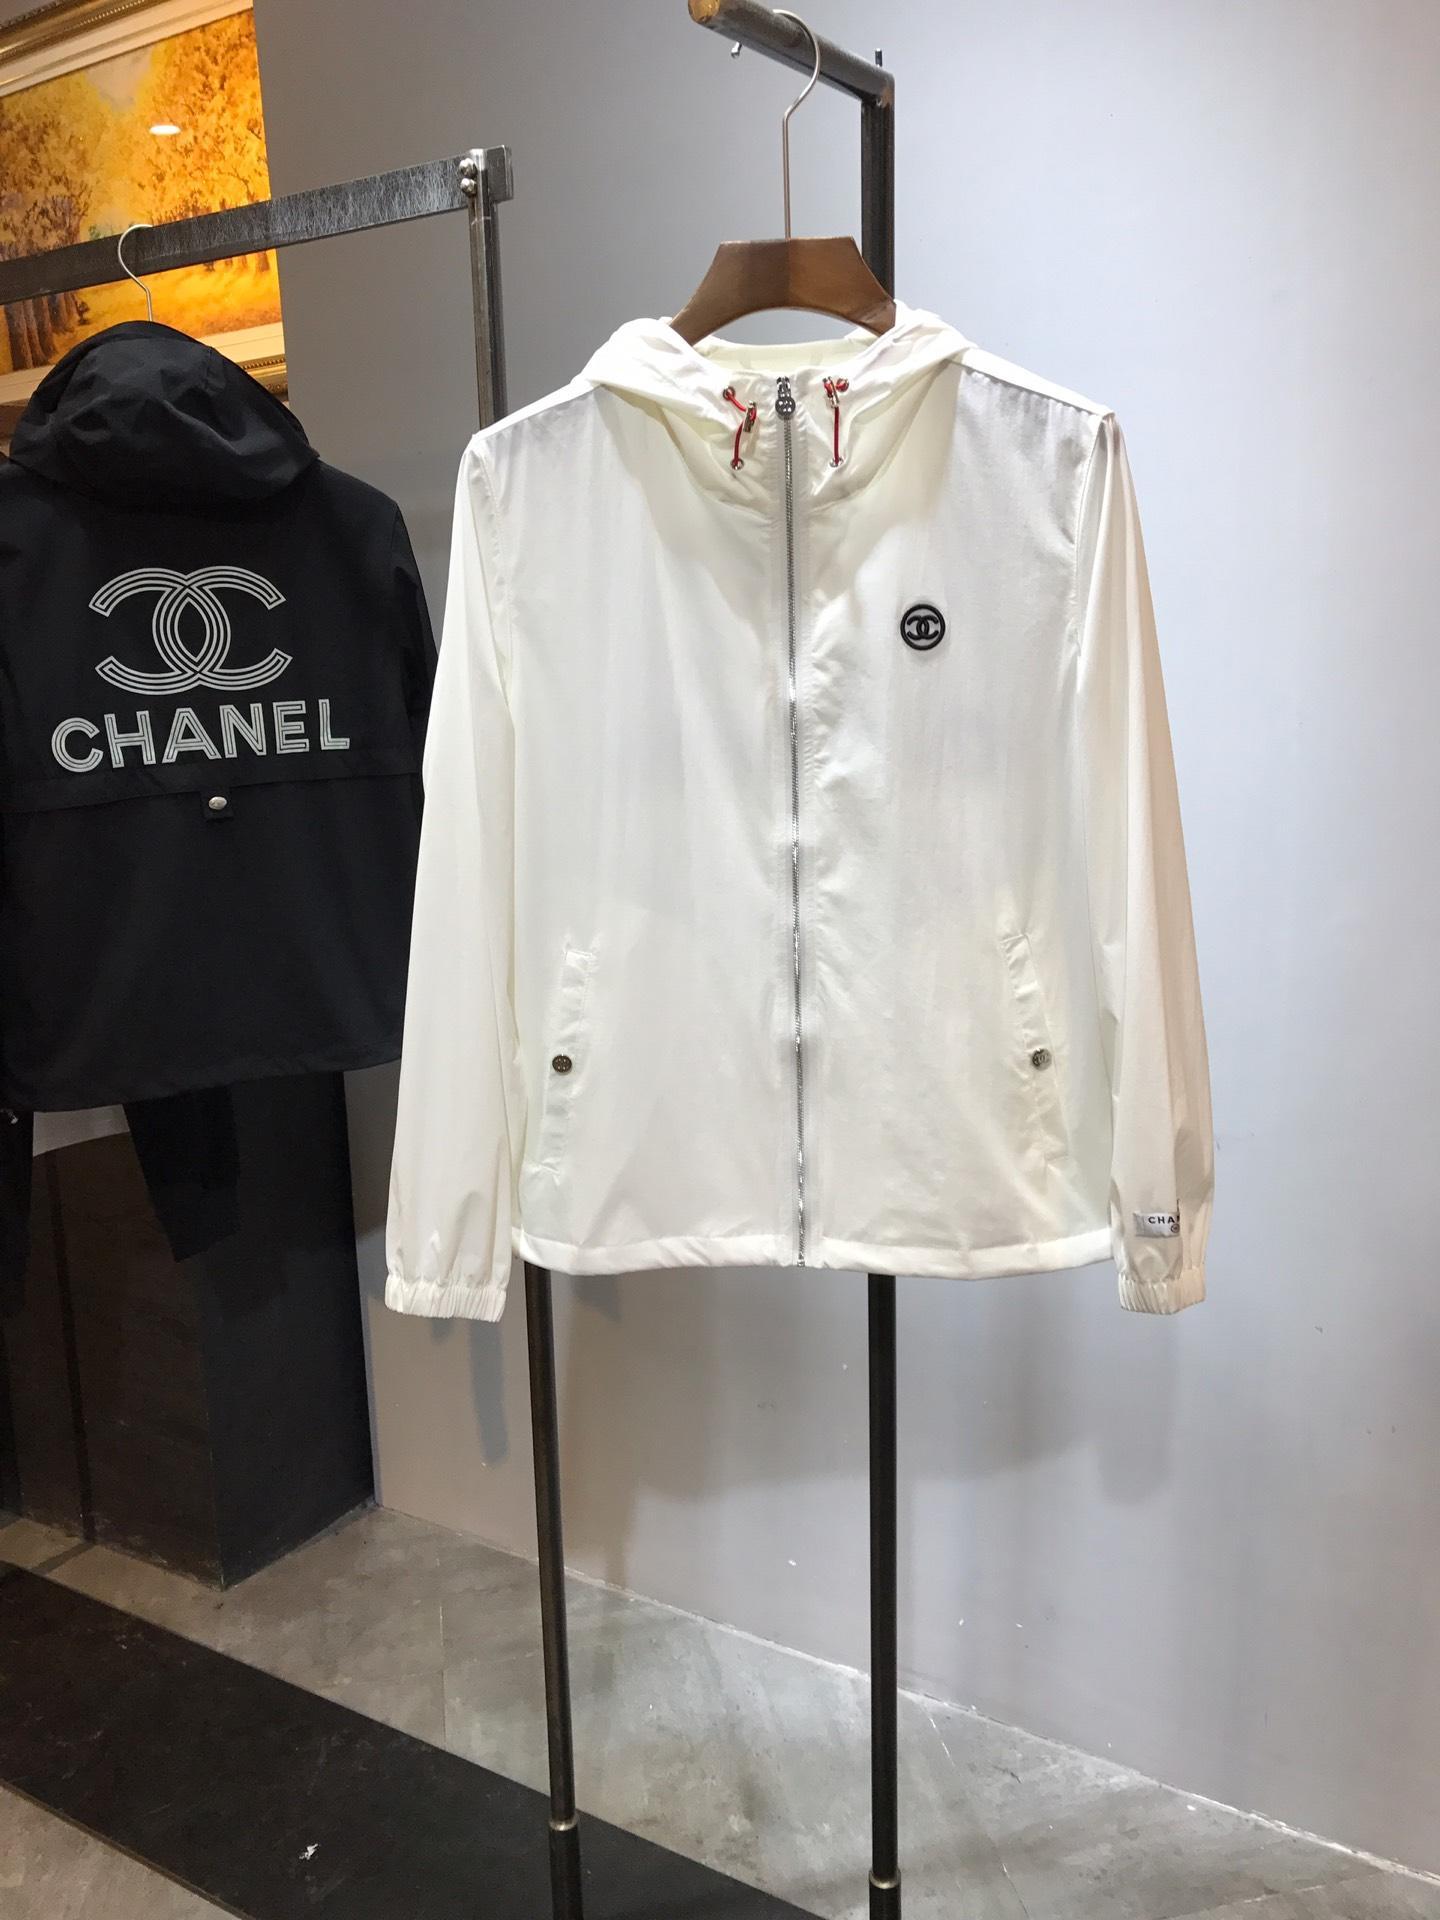 Chanel シャネル カップル コート スーパーコピーブランド 通販代引き 安全サイト